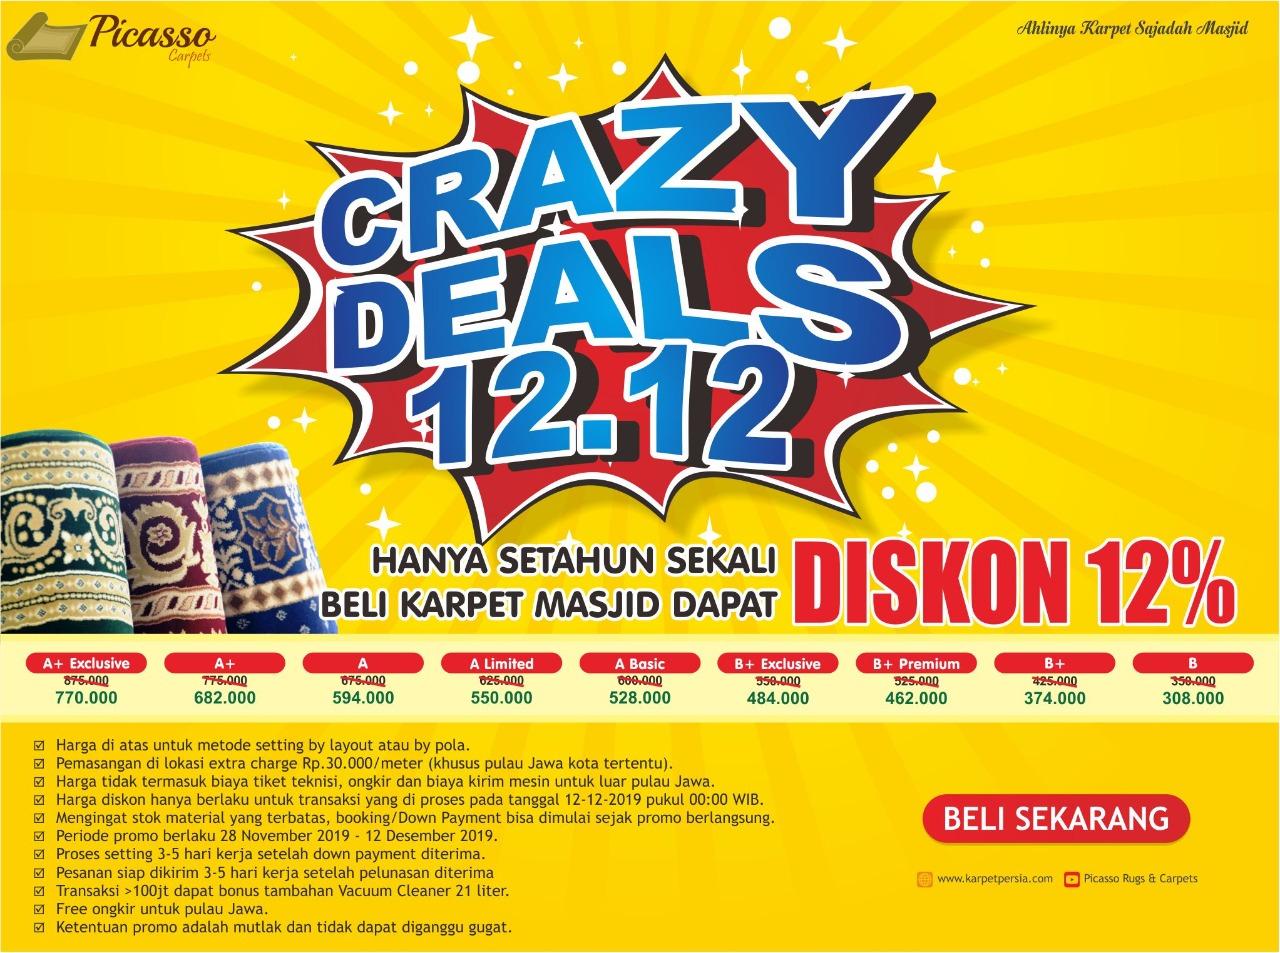 Promo Karpet Masjid Crazy Deals 12.12 Diskon 12%